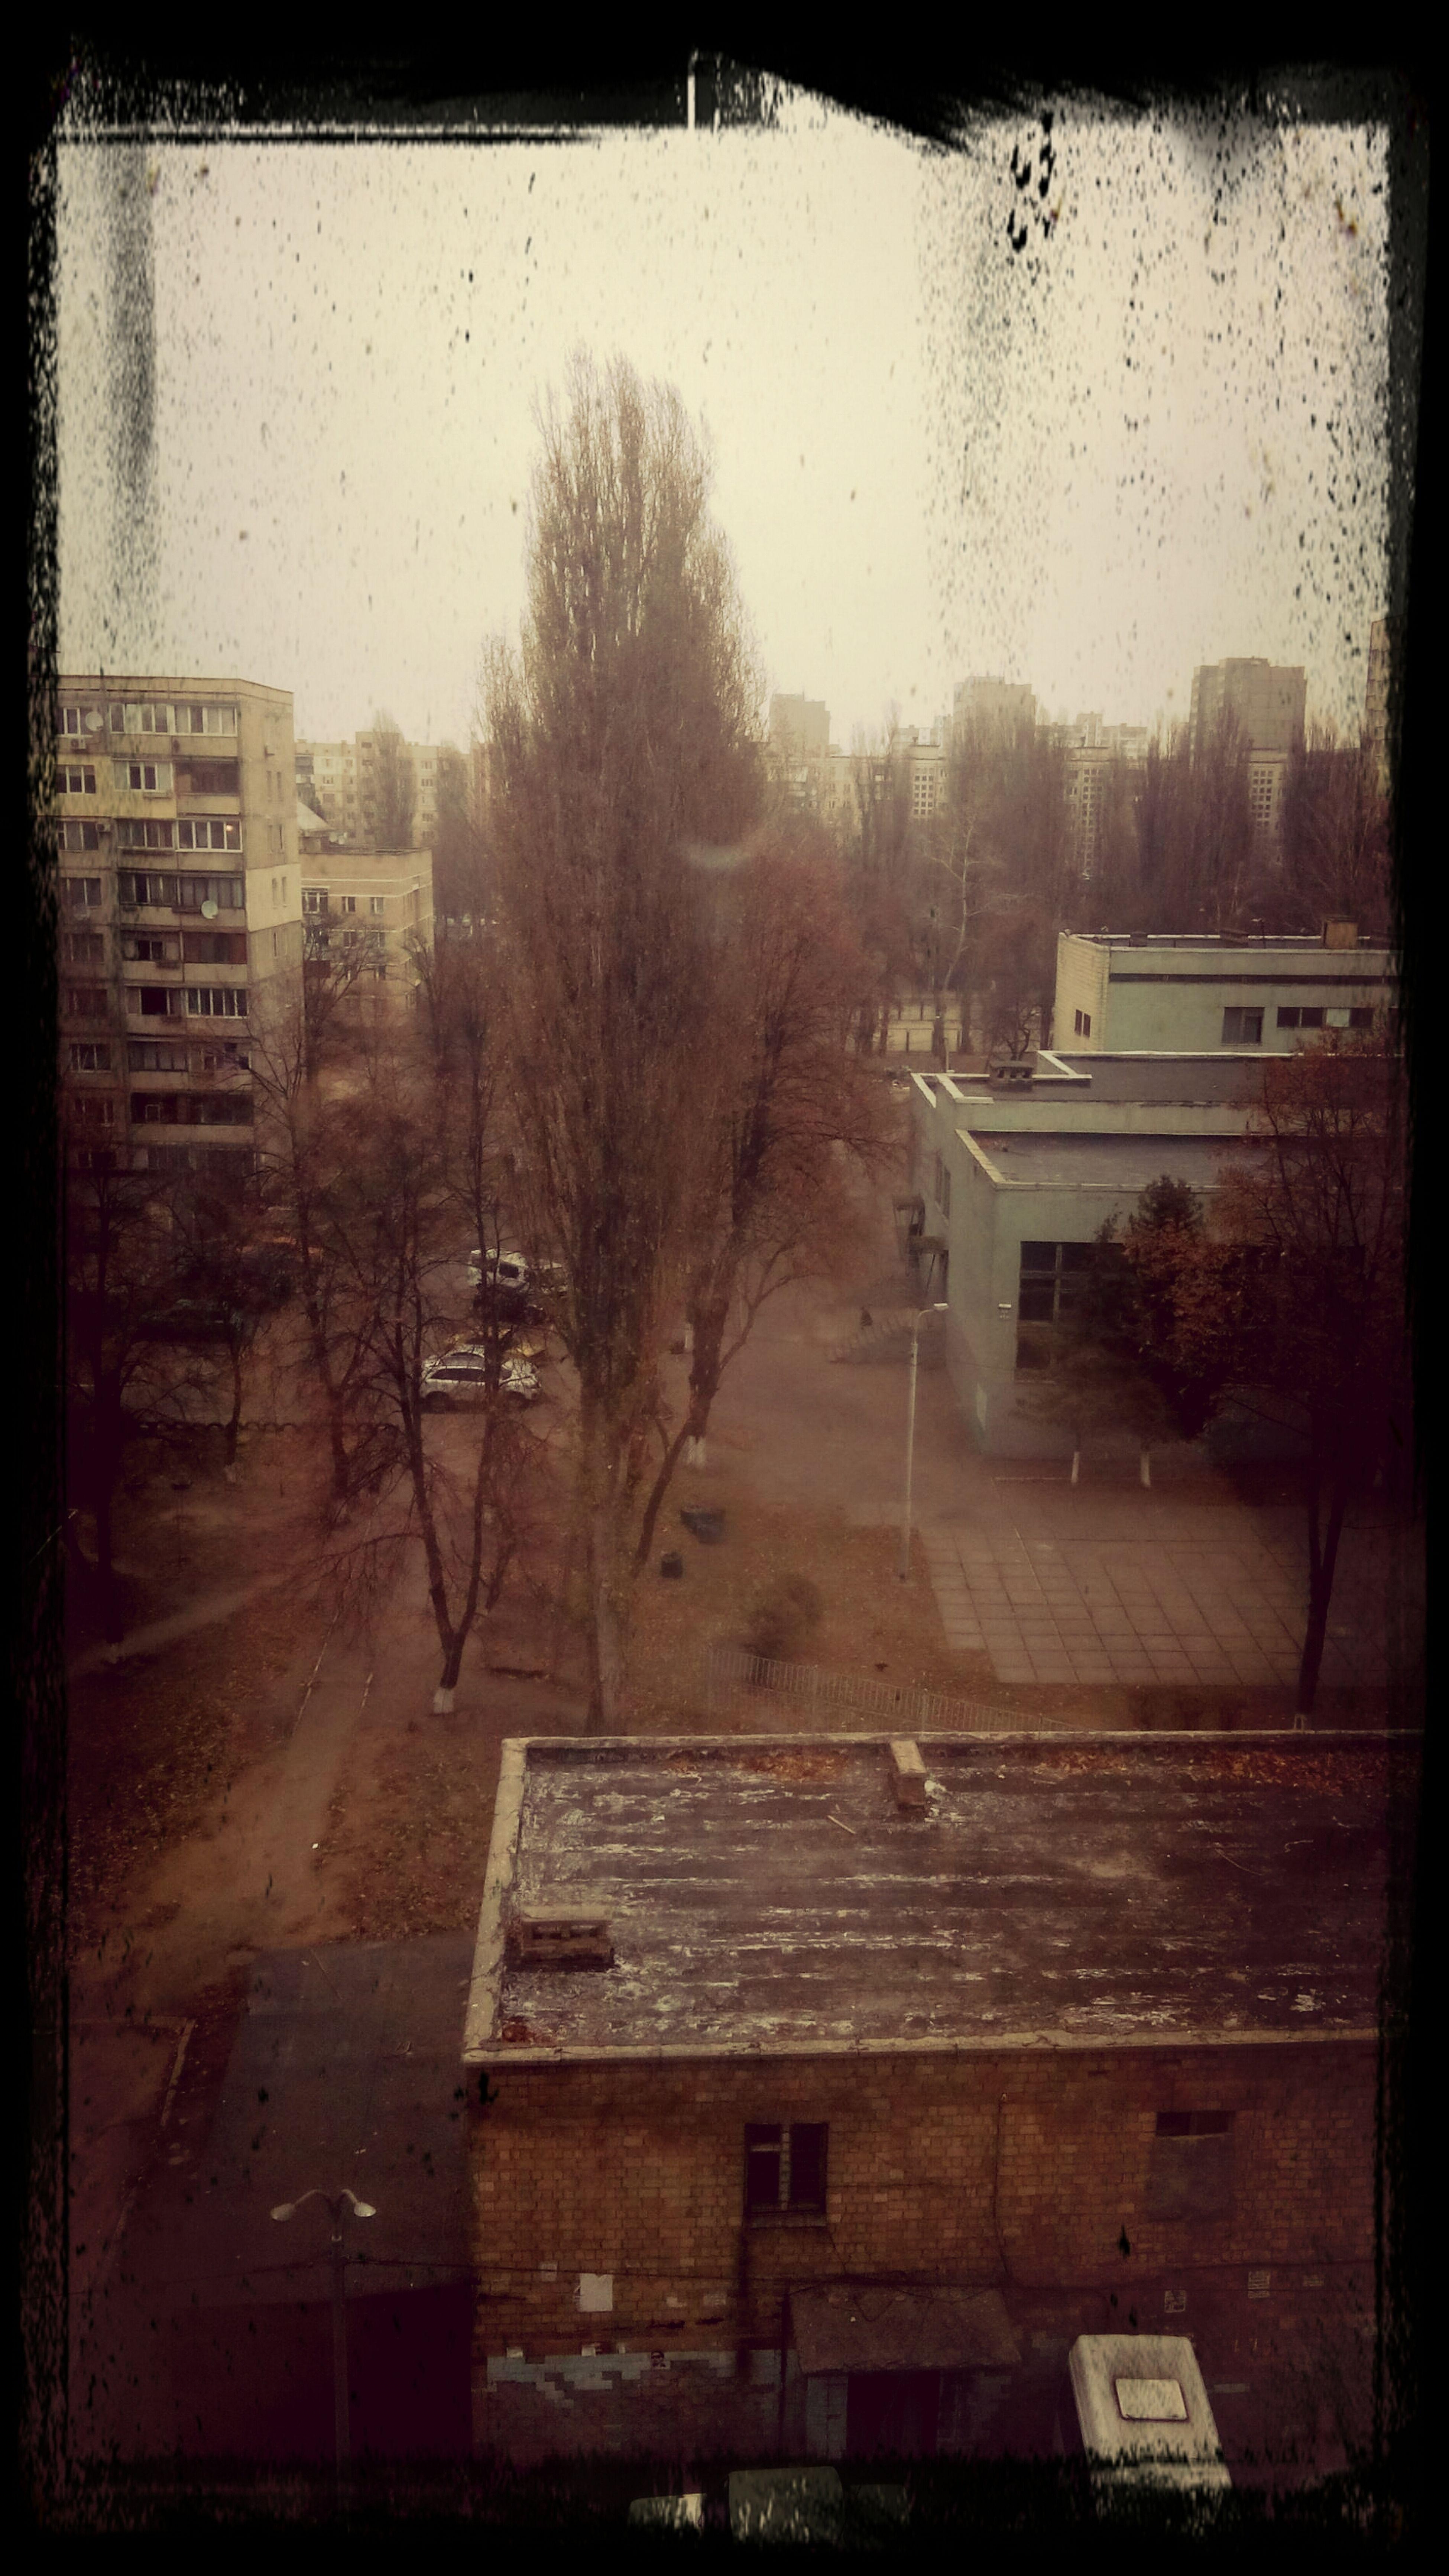 Киев епт)) Studying